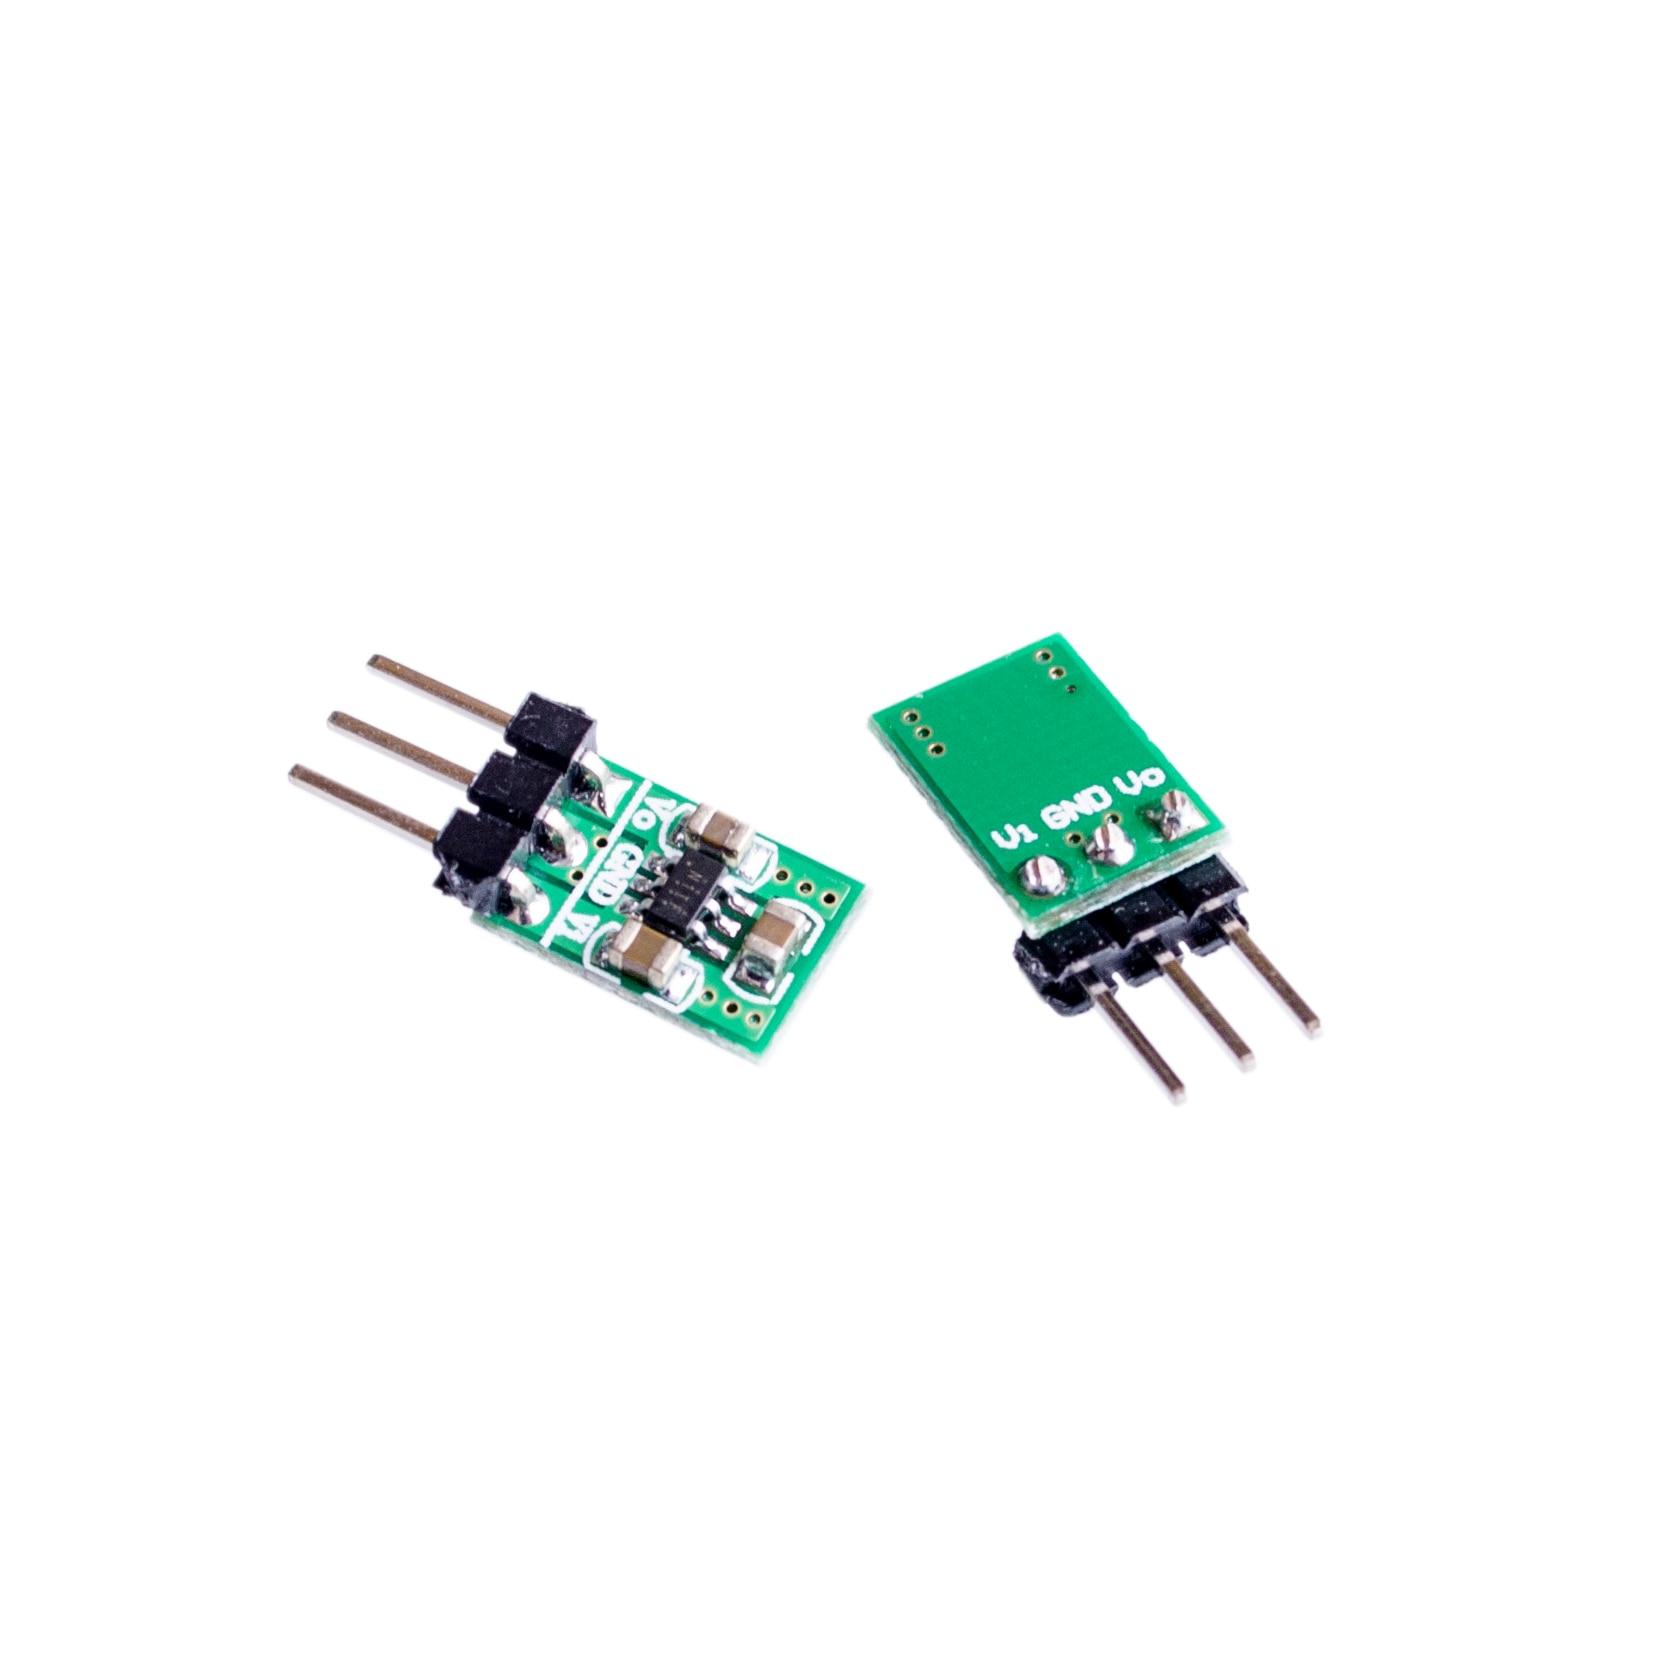 mini 2 in 1 DC DC Step-Down & Step-Up Converter 1.8V-5V to 3.3V Power Wifi Bluetooth ESP8266 HC-05 CE1101 LED Module